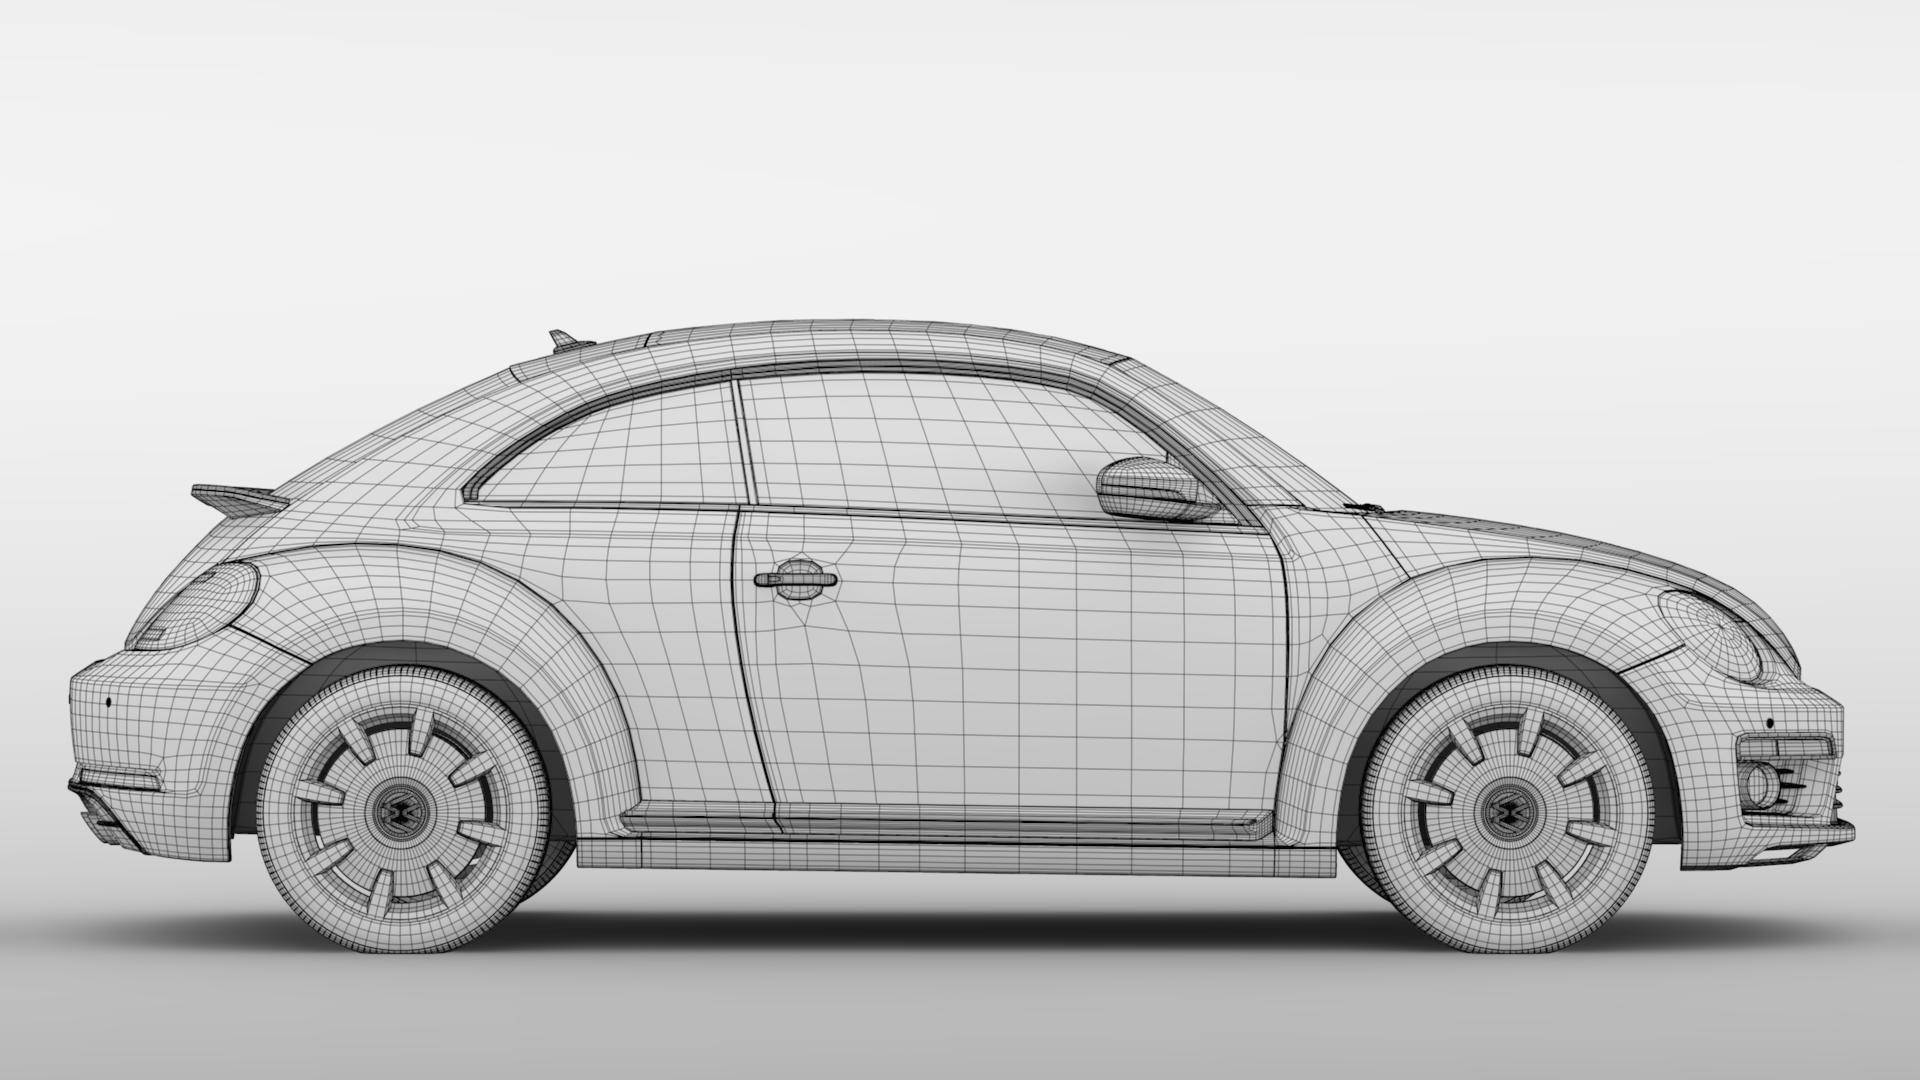 vw beetle turbo 2017 3d model 3ds max fbx c4d lwo ma mb hrc xsi obj 221676